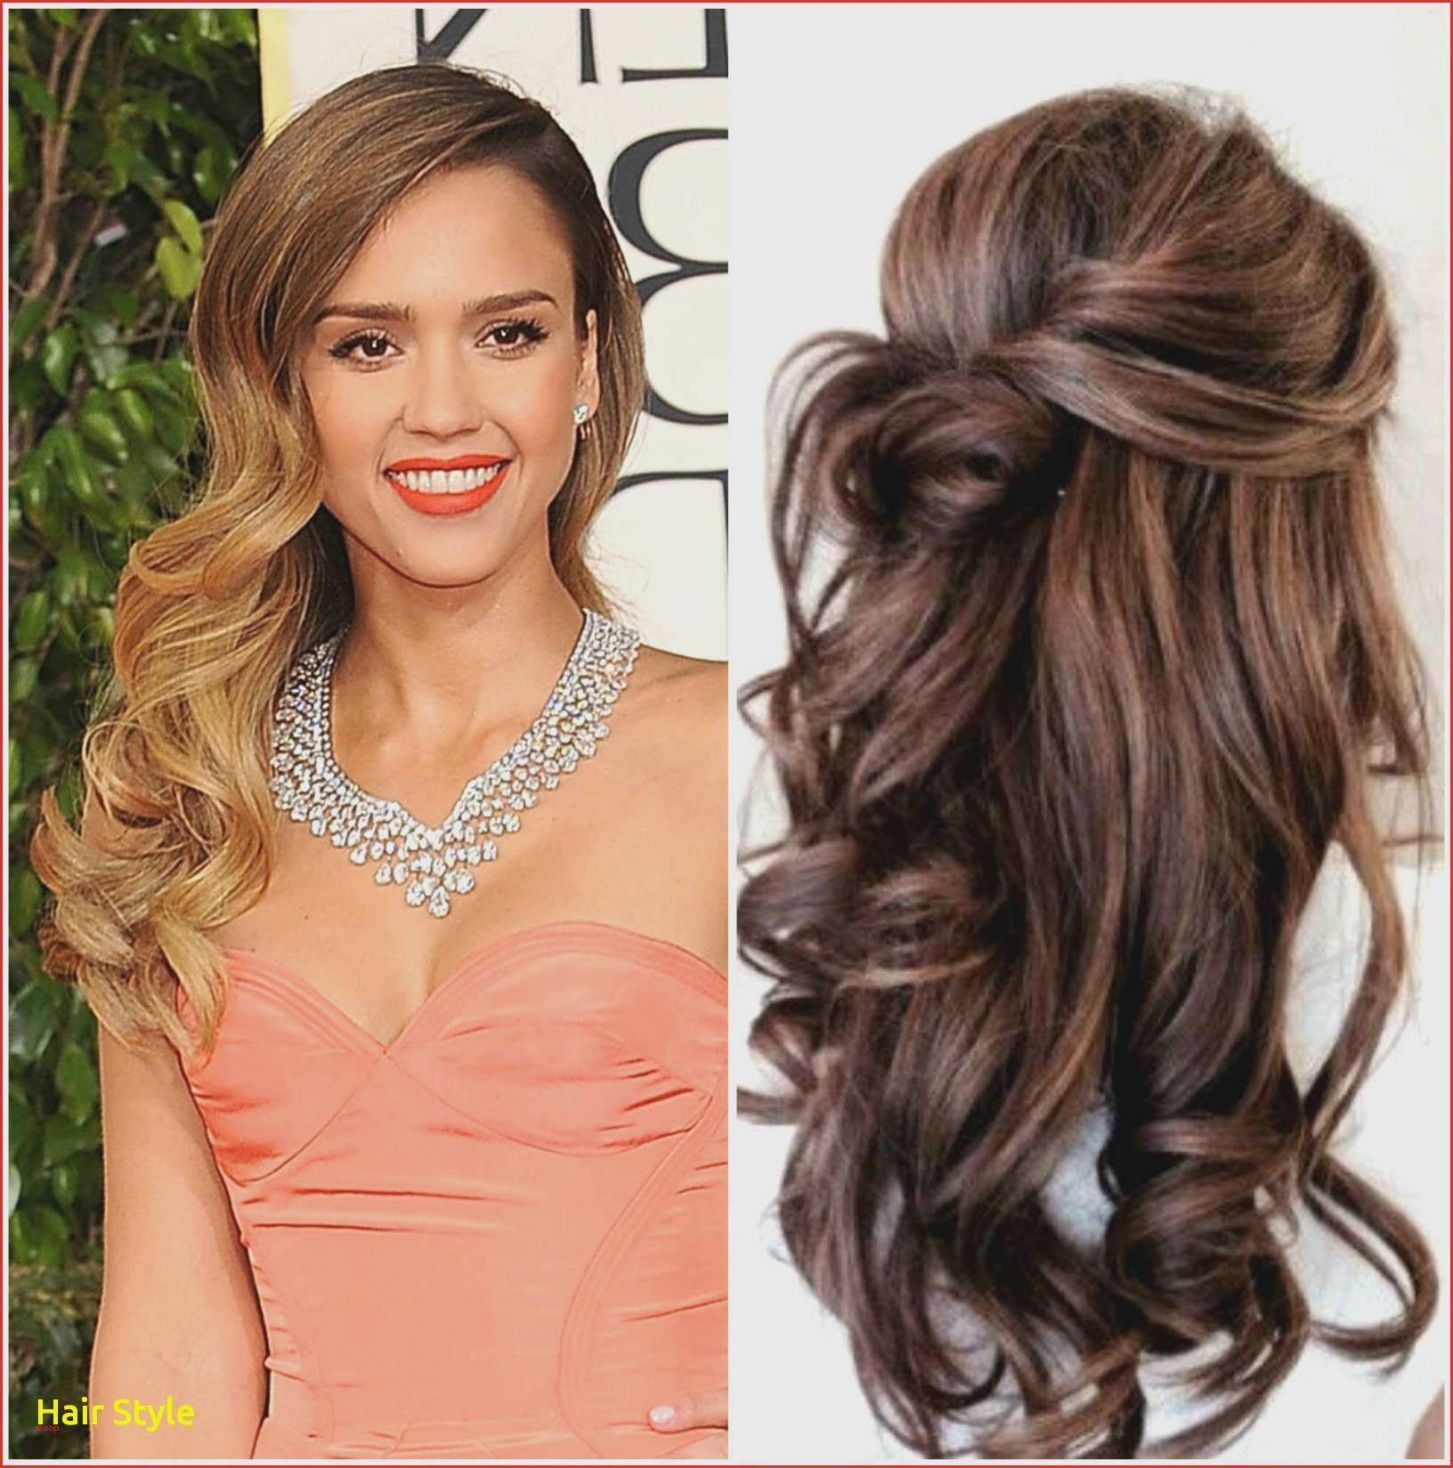 Hairstyles Wedding Hairstyle Thin Hair Shoulder Length Hairstyles Medium Hair Styles Wedding Hairstyles Thin Hair Medium Length Hair Styles